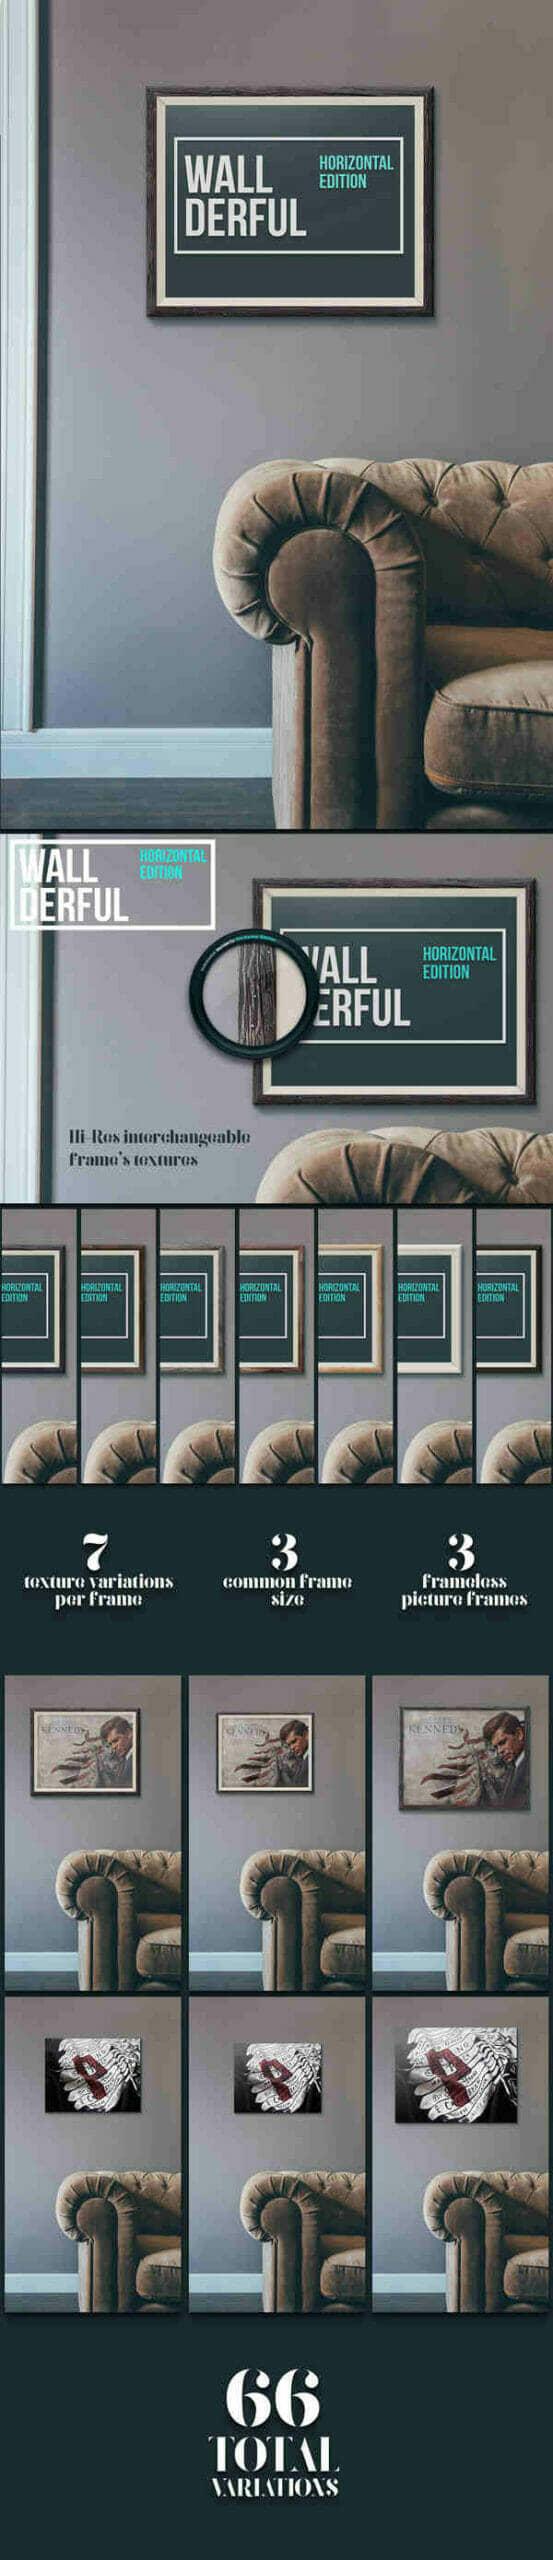 Wallderful: Horizontal Frames Mockups